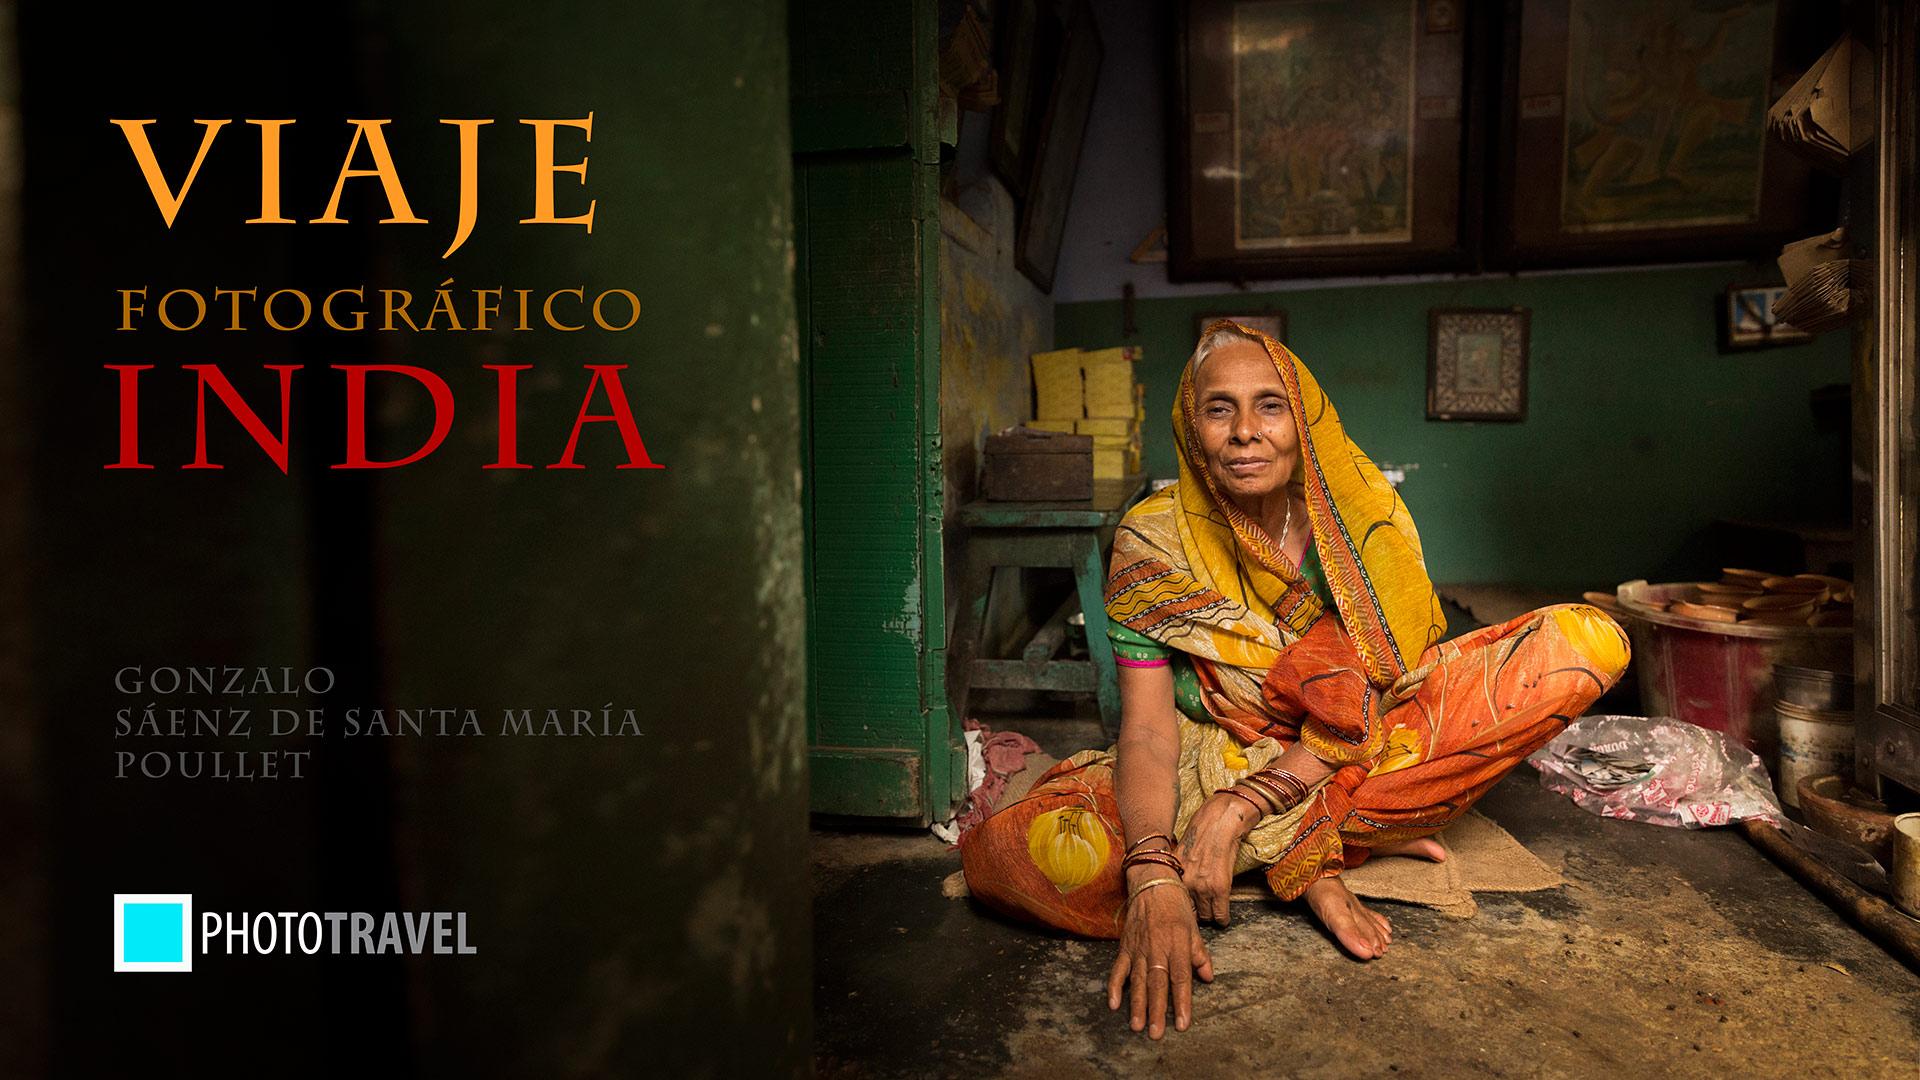 Viaje Fotográfico India 2018